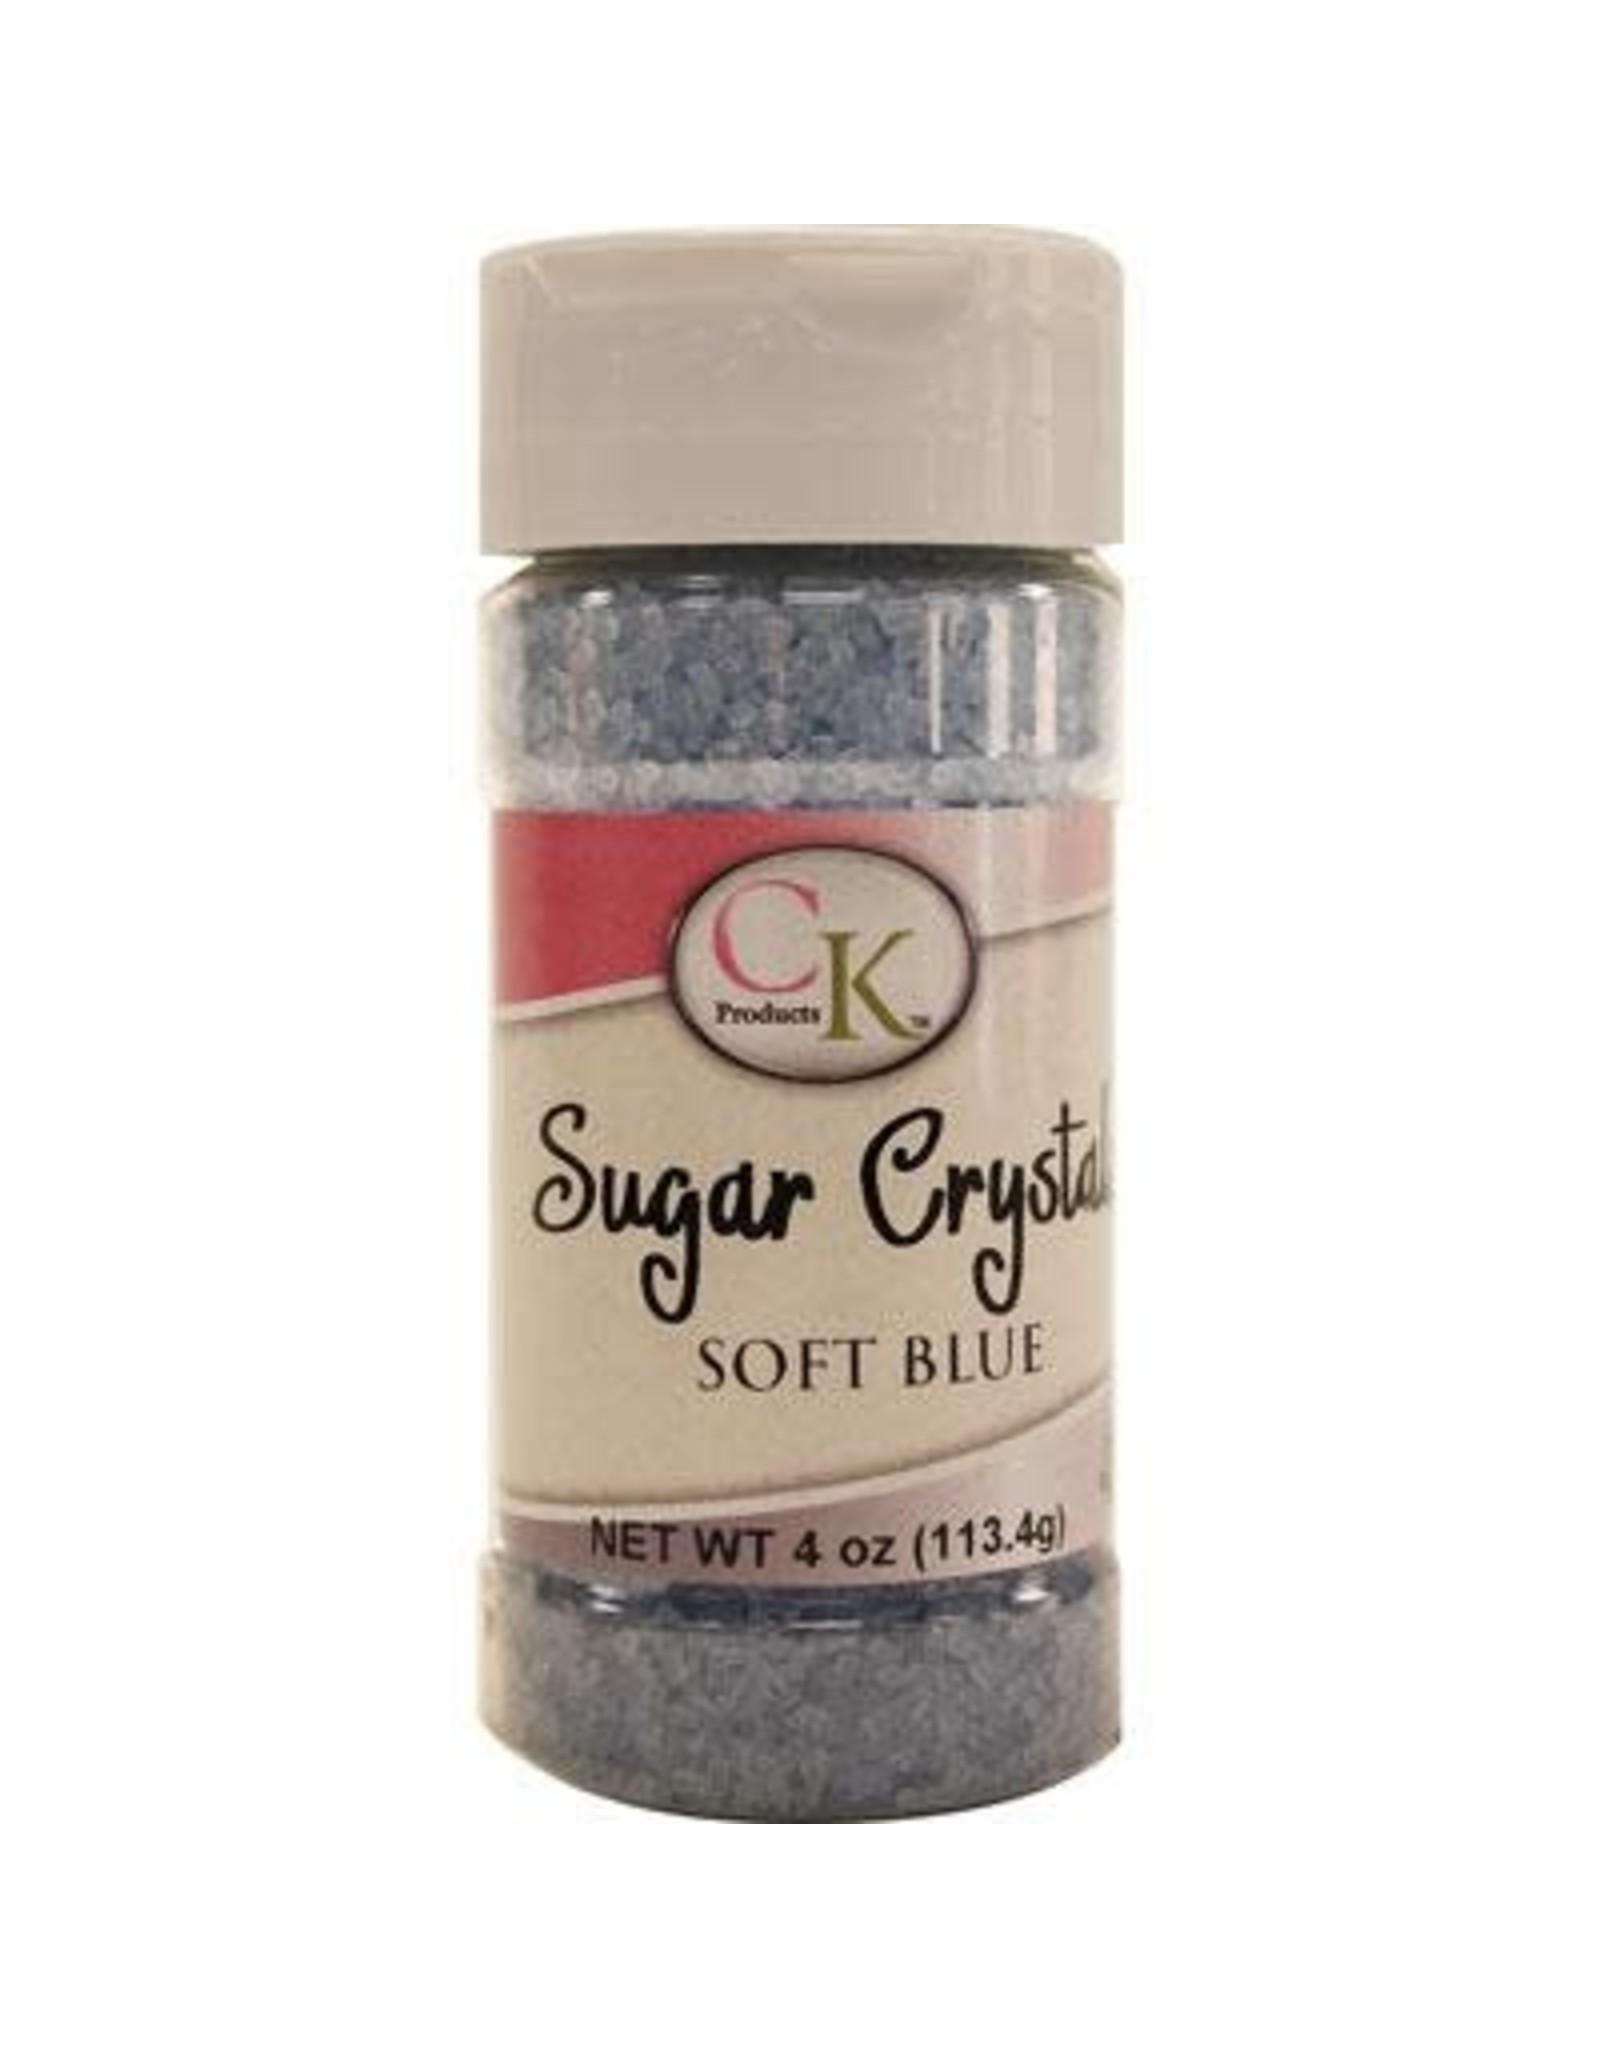 CK Soft Blue Sugar Crystals